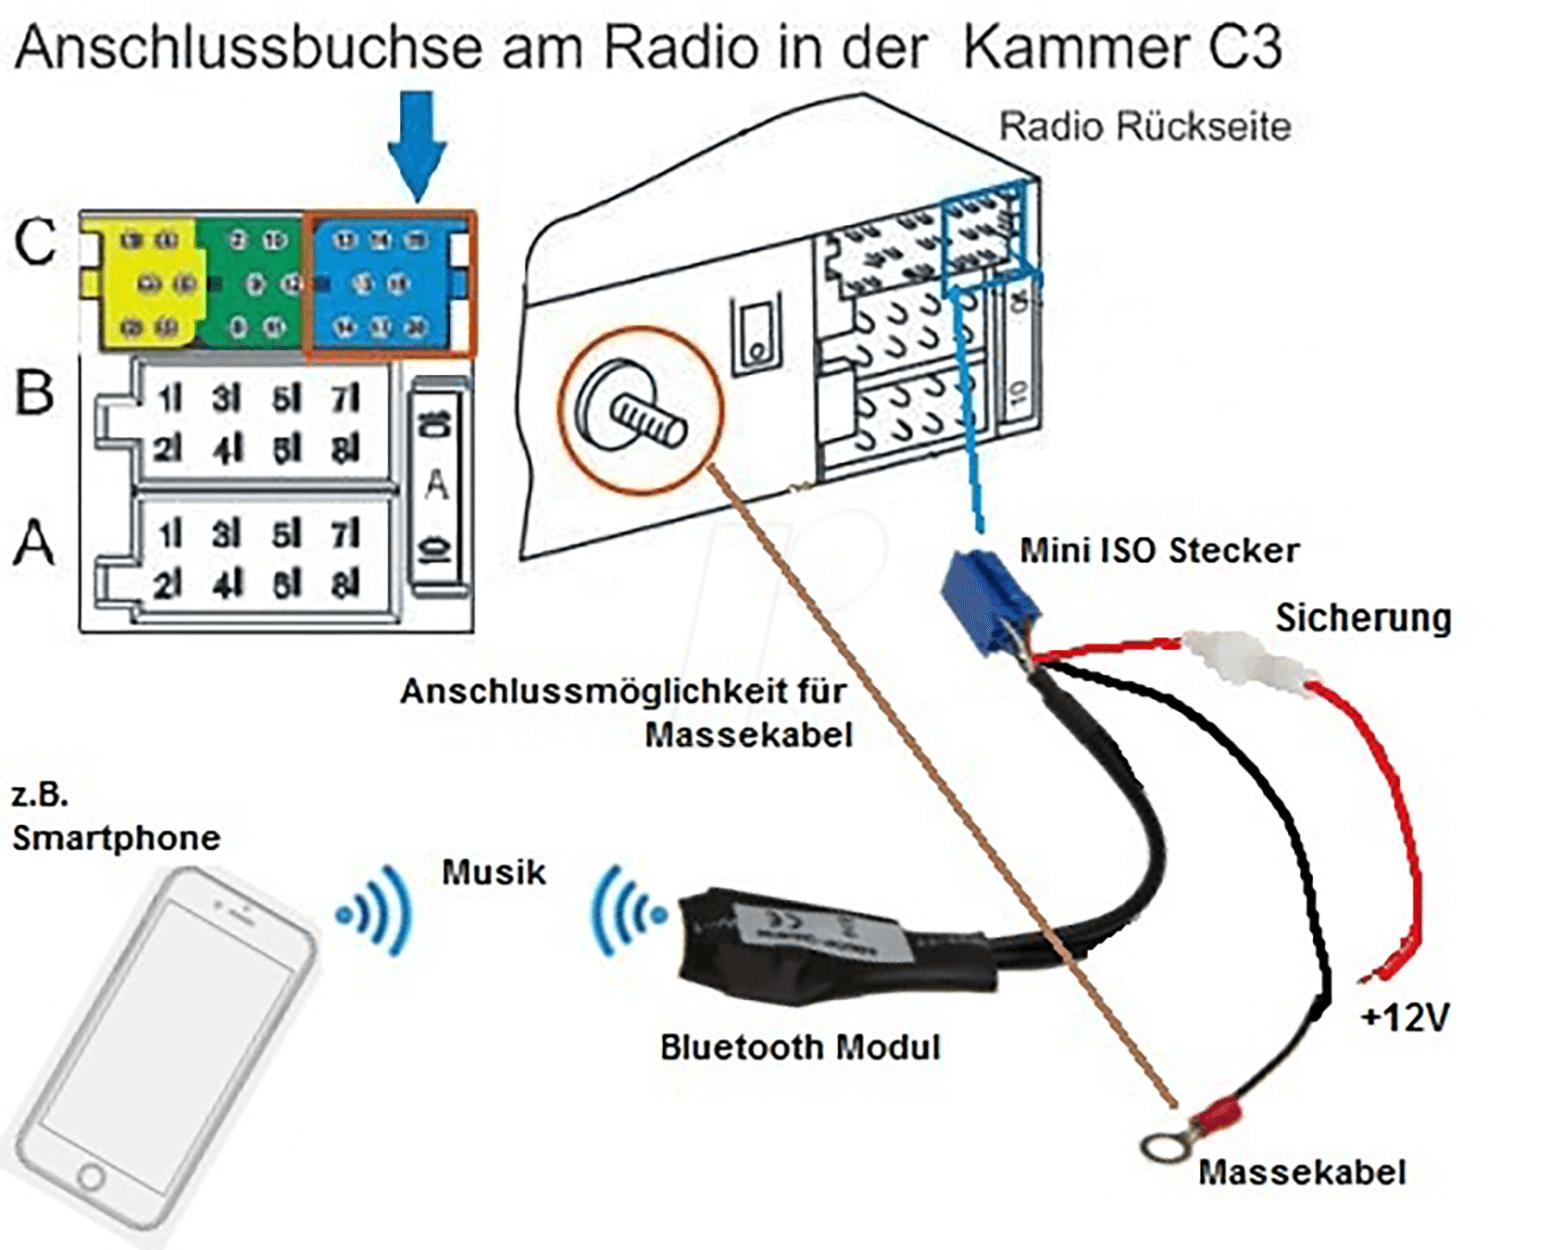 iso trailer wiring diagram au 5119 car stereo aux adapter at reichelt elektronik  au 5119 car stereo aux adapter at reichelt elektronik